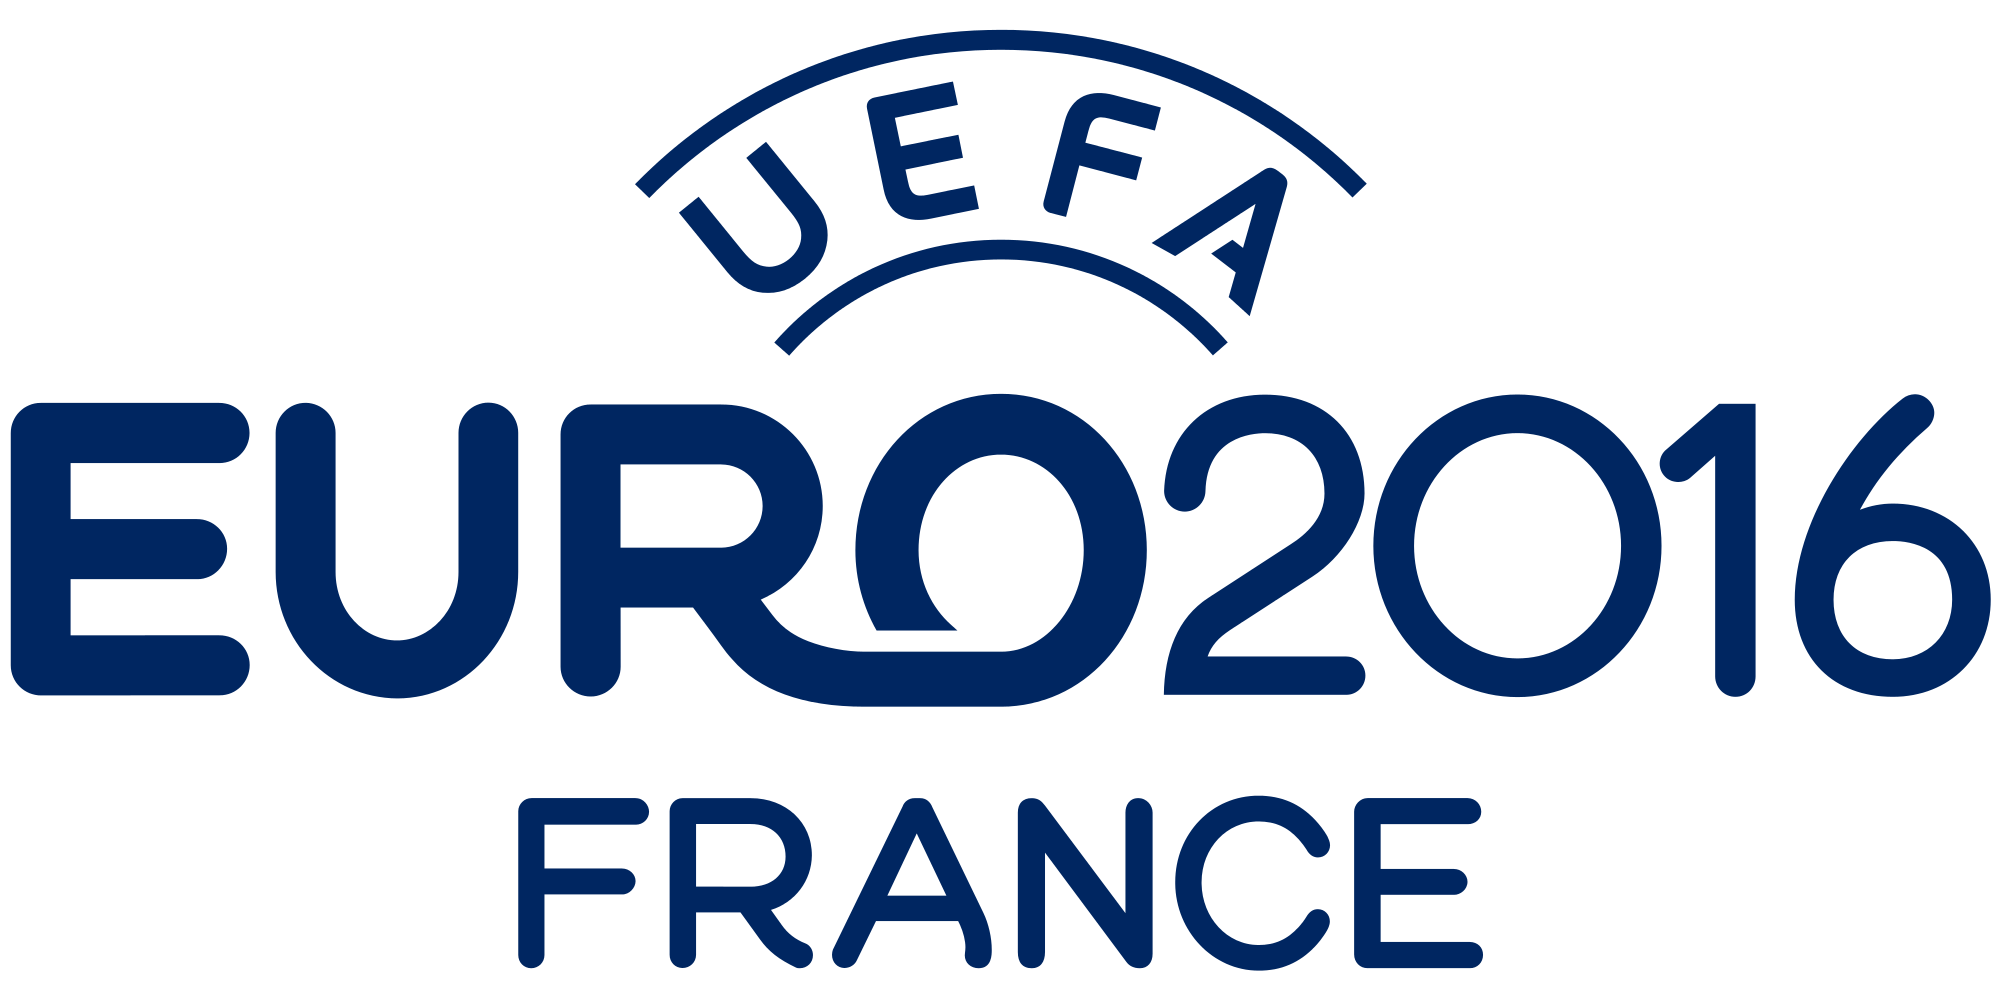 Uefa Vector Logos PNG - 35743